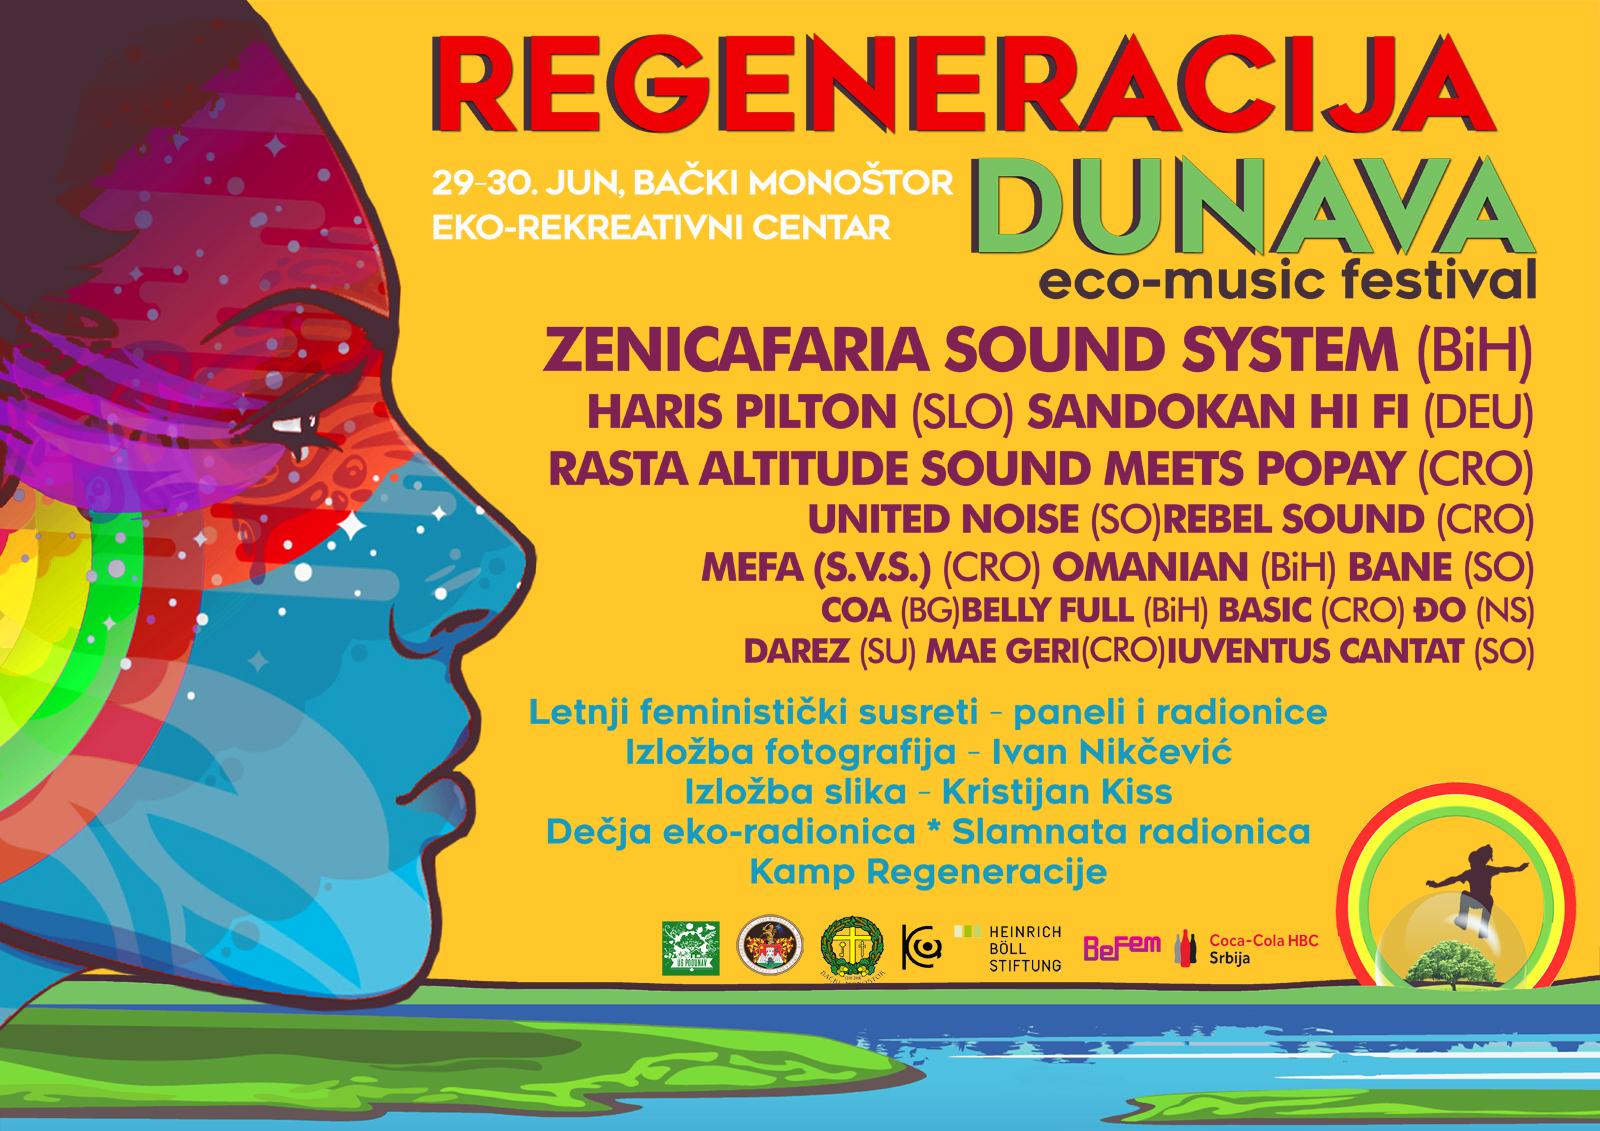 Regeneracija Dunava 2018 plakat 1